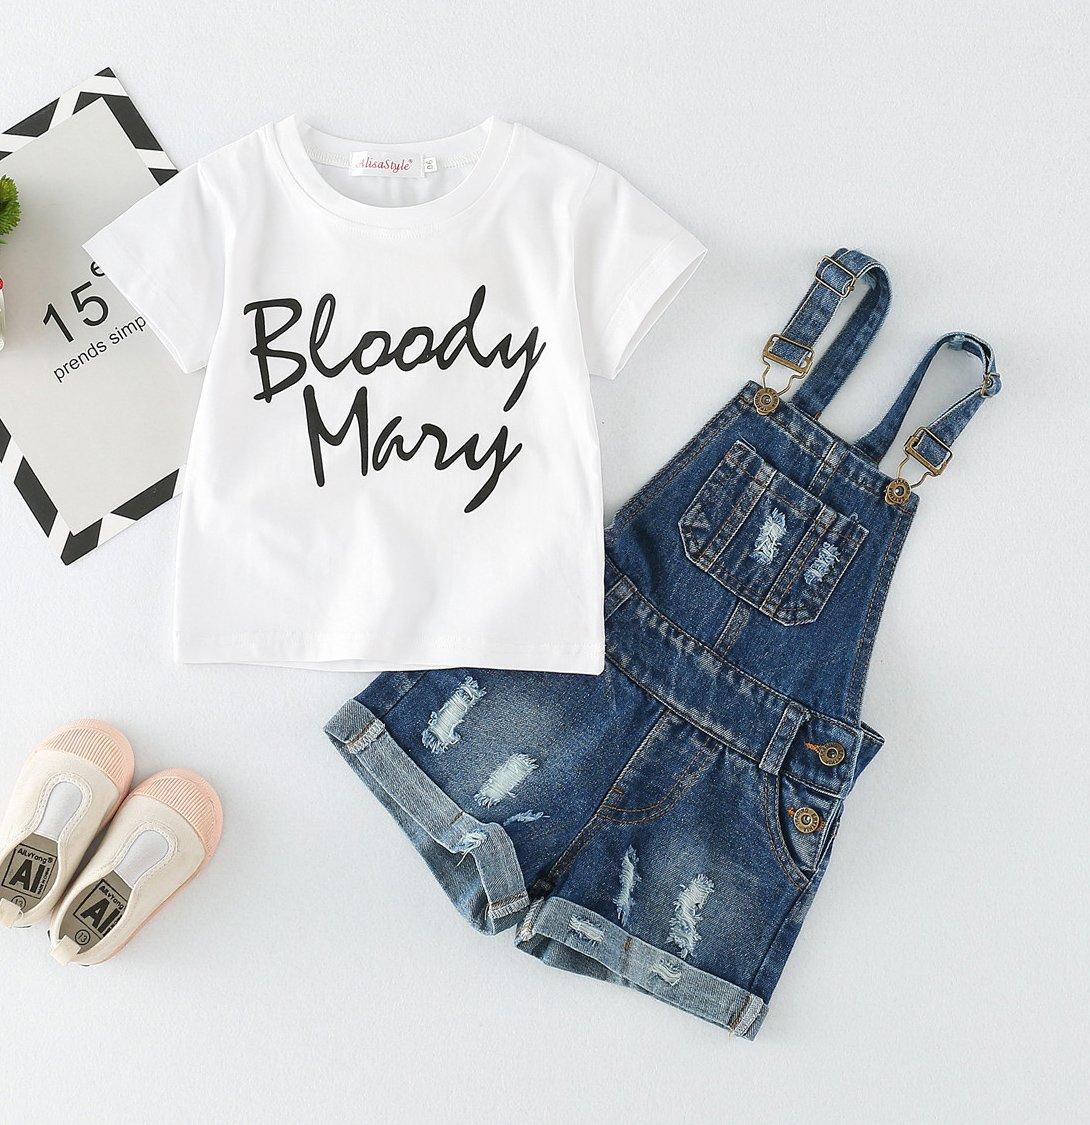 Chumhey Big&Little Girls 2Pc Big Bib Jeans Summer Shortalls Set T-Shirts,Blue,6-7 Years by Chumhey (Image #3)